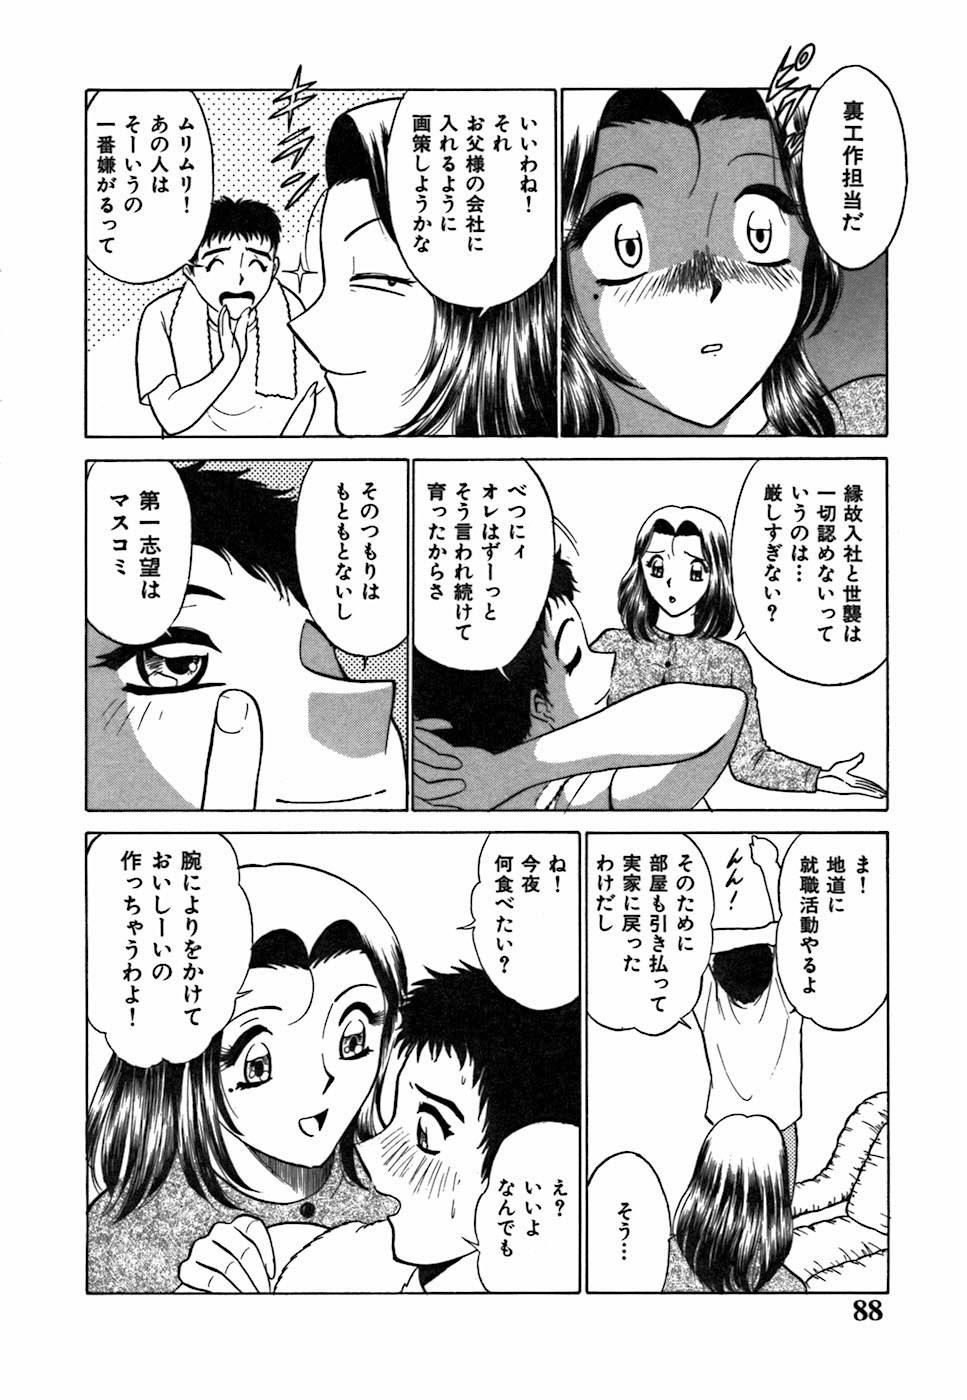 Kimi ga Nozomu Katachi | Appearance for which you hope 87